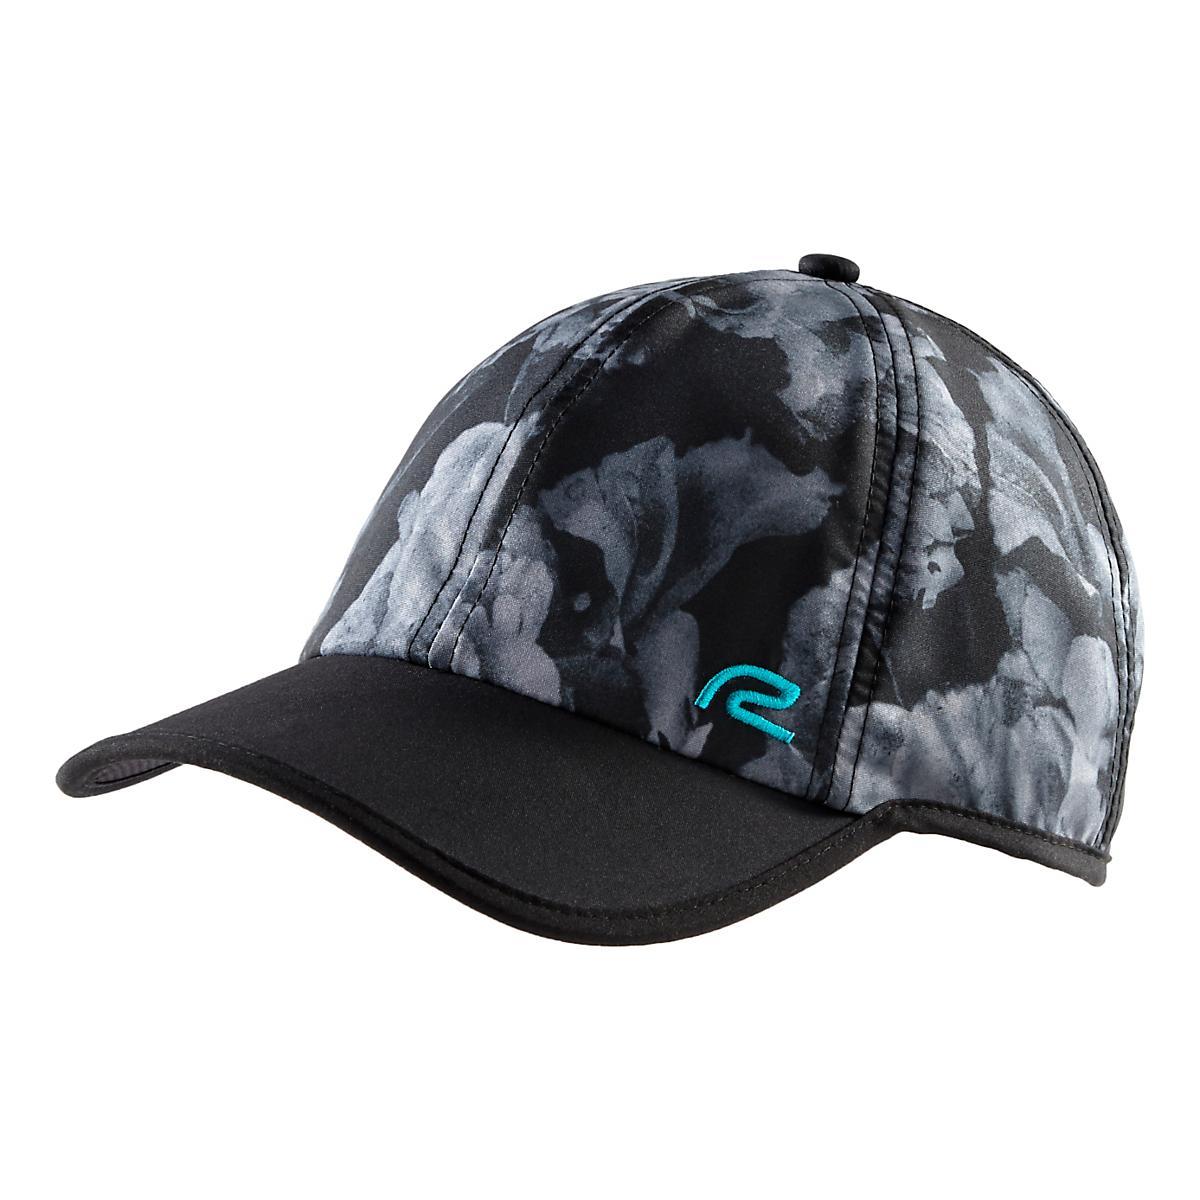 R-Gear�Love Your Look Cap